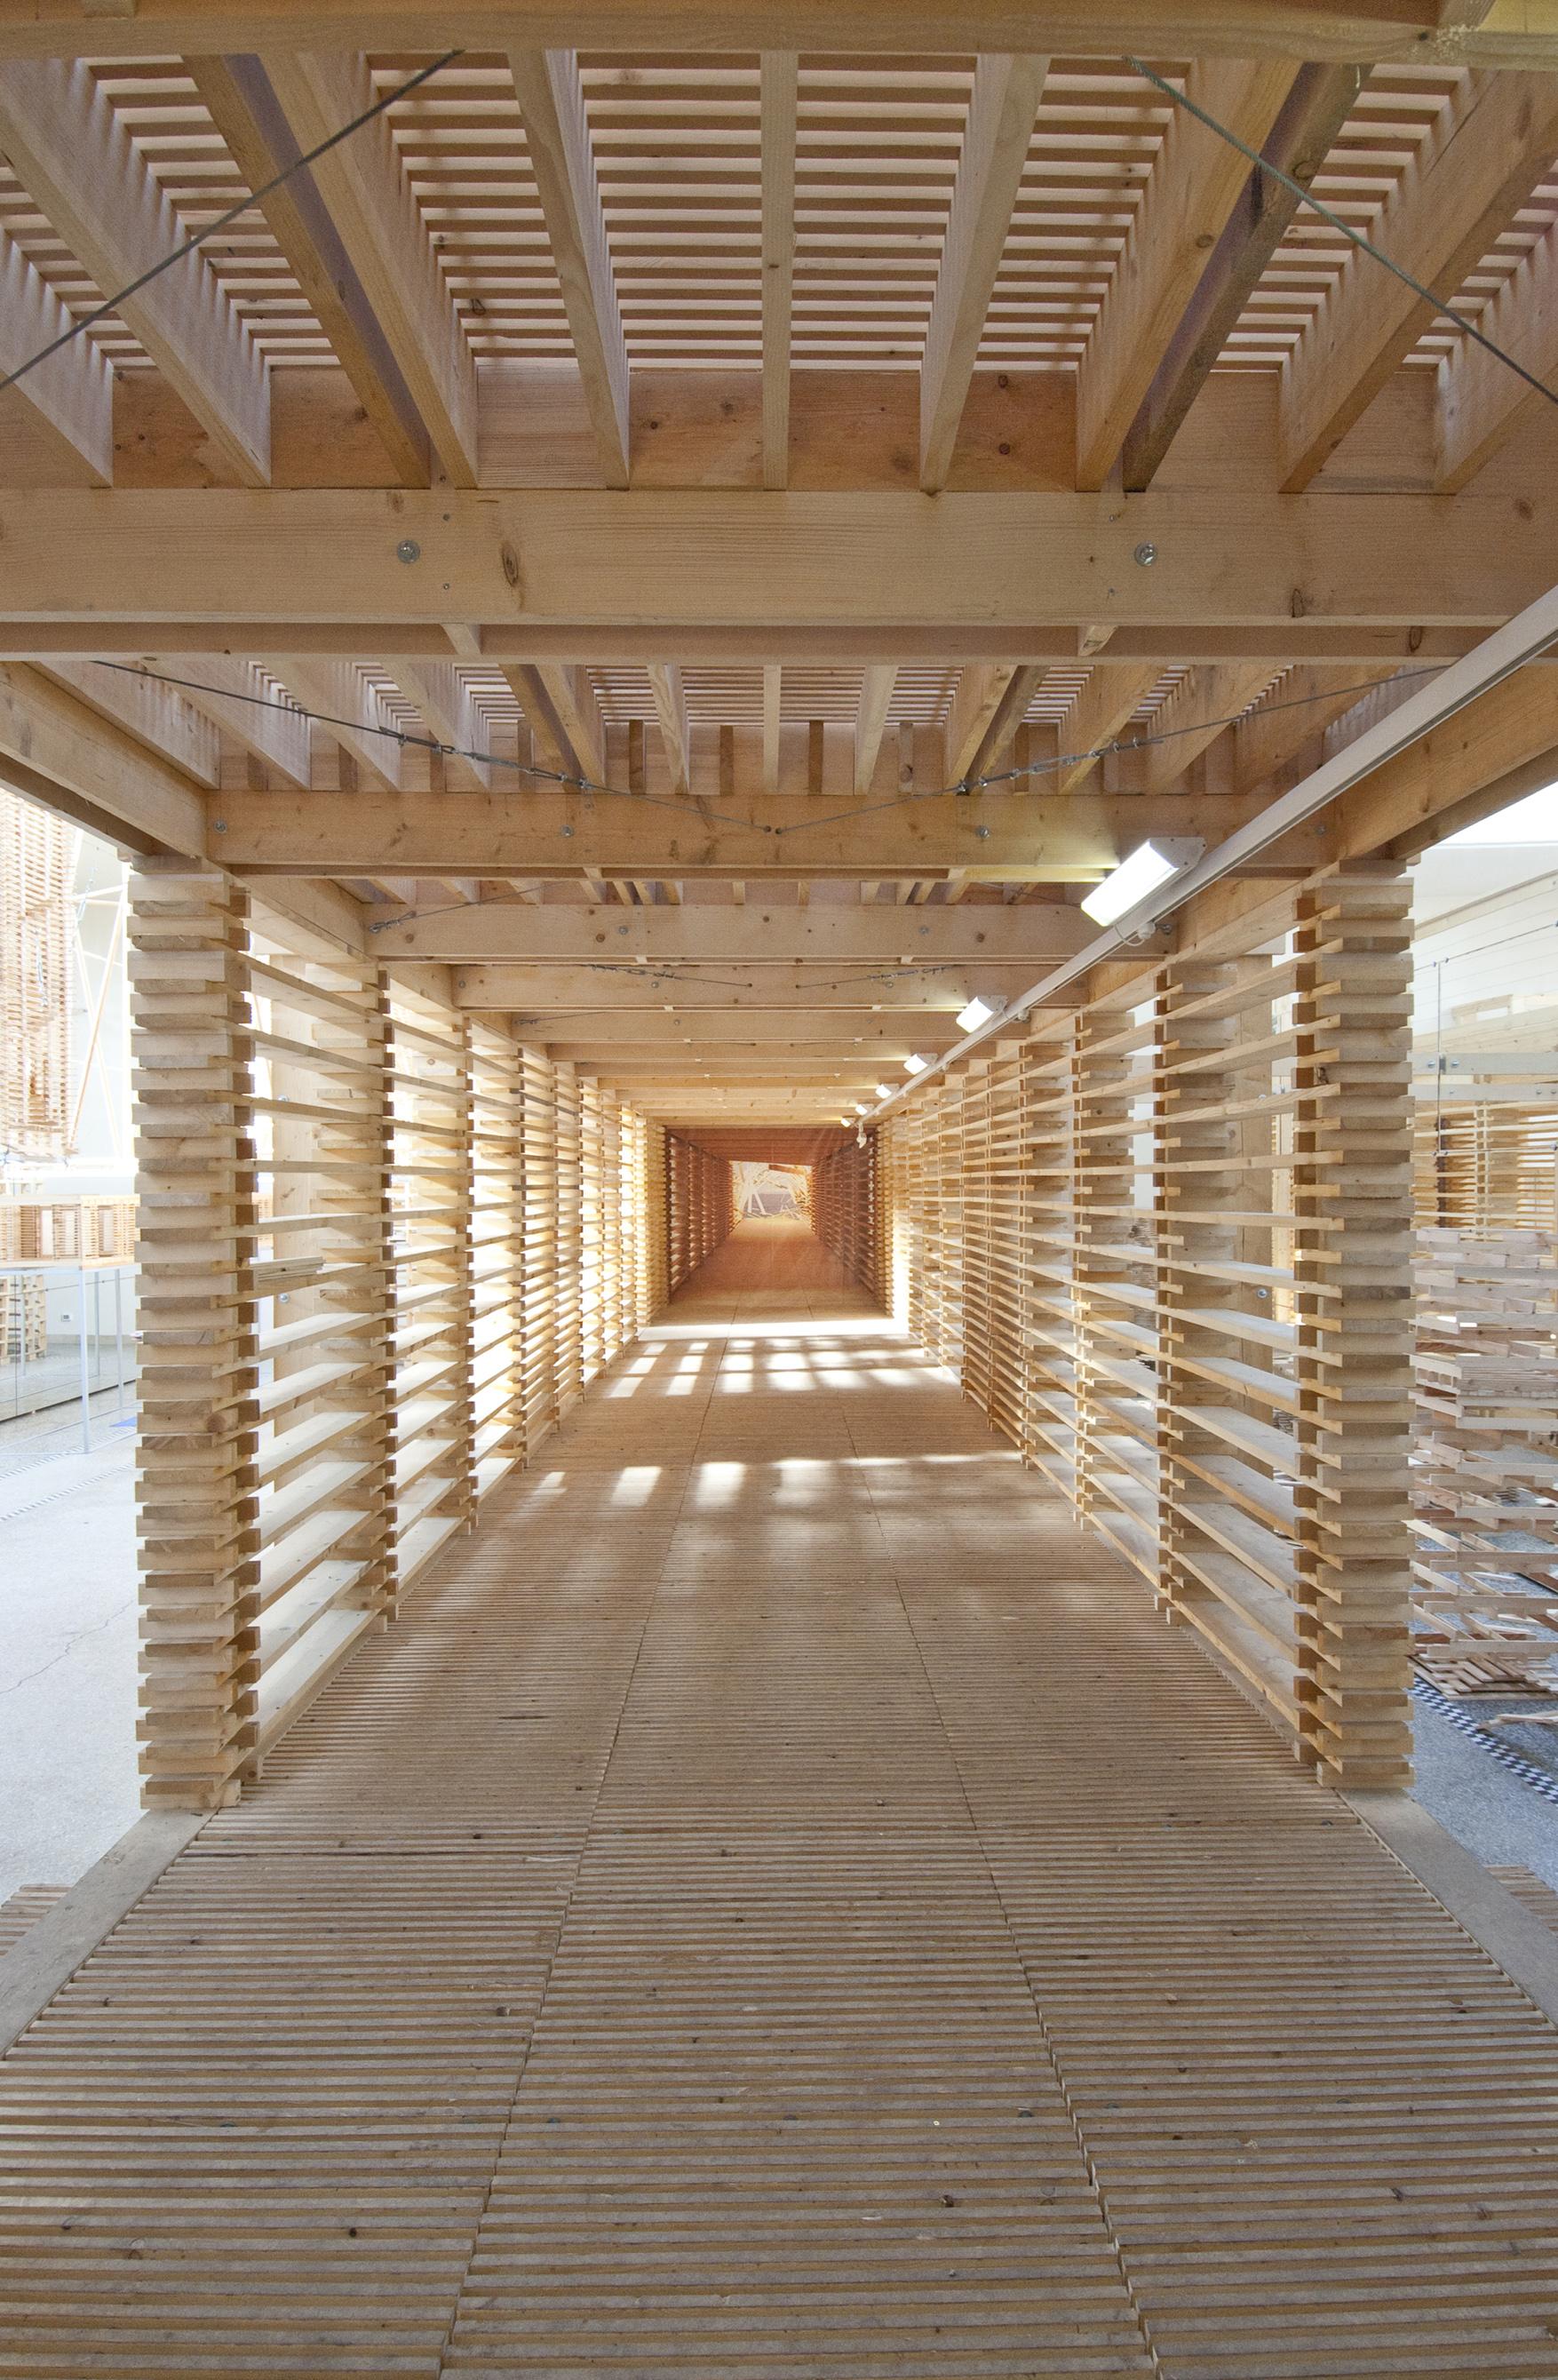 La biennale di venezia people meet in architecture ben for Wood architectural columns